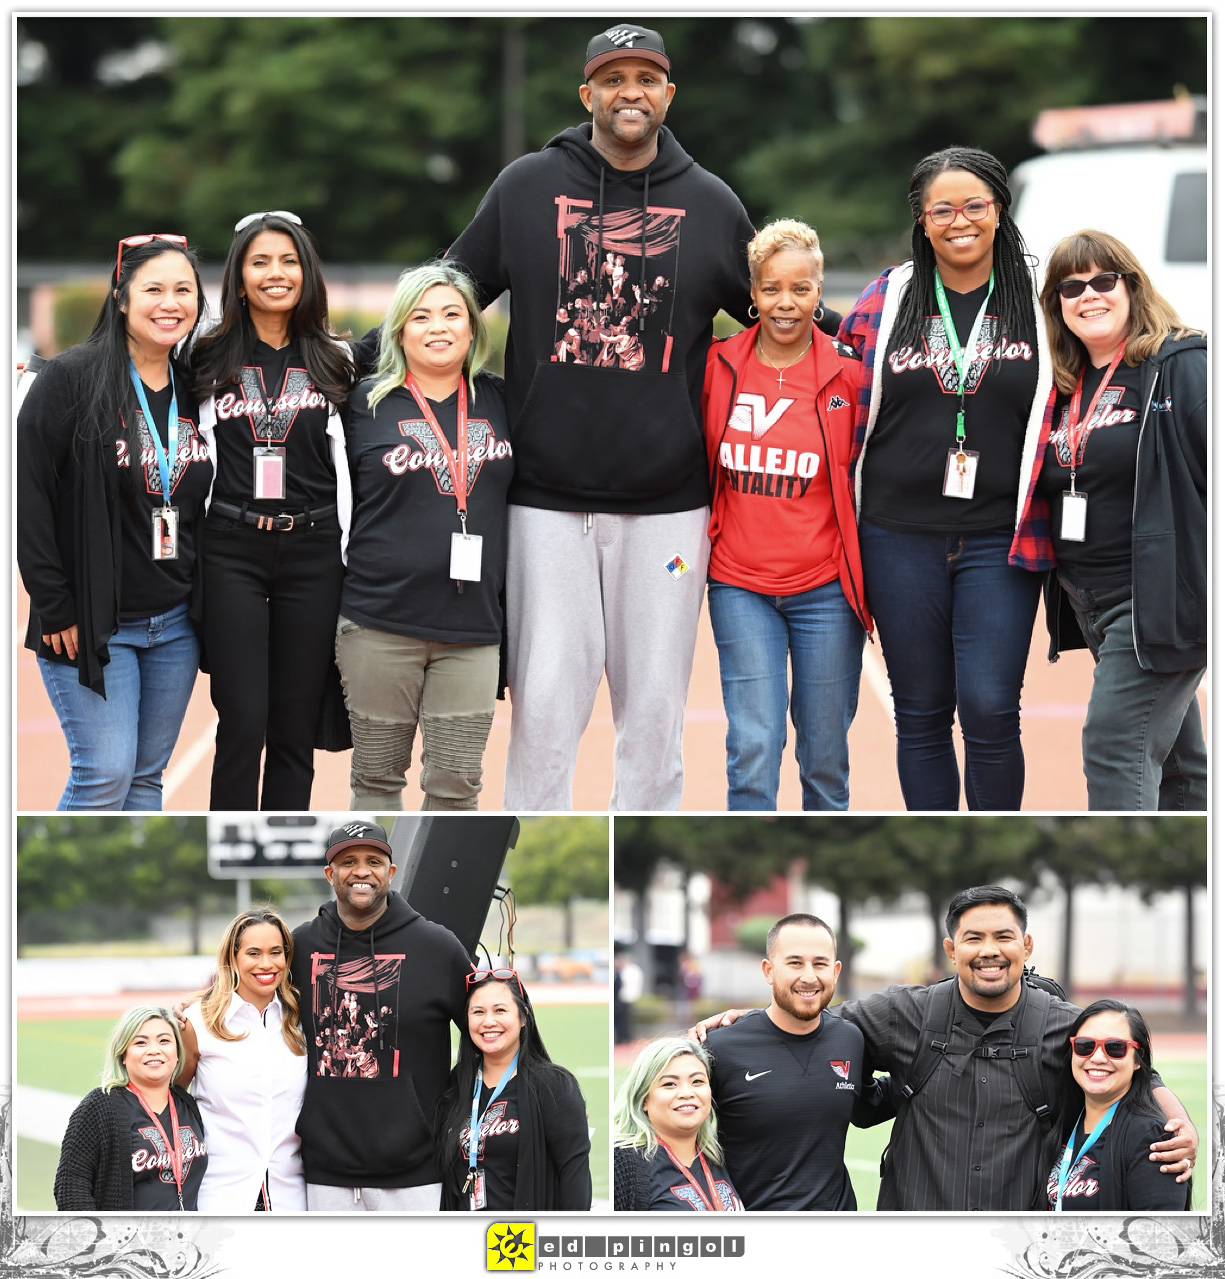 2018.09.06 - PitCCh In at Vallejo High School 002.JPG